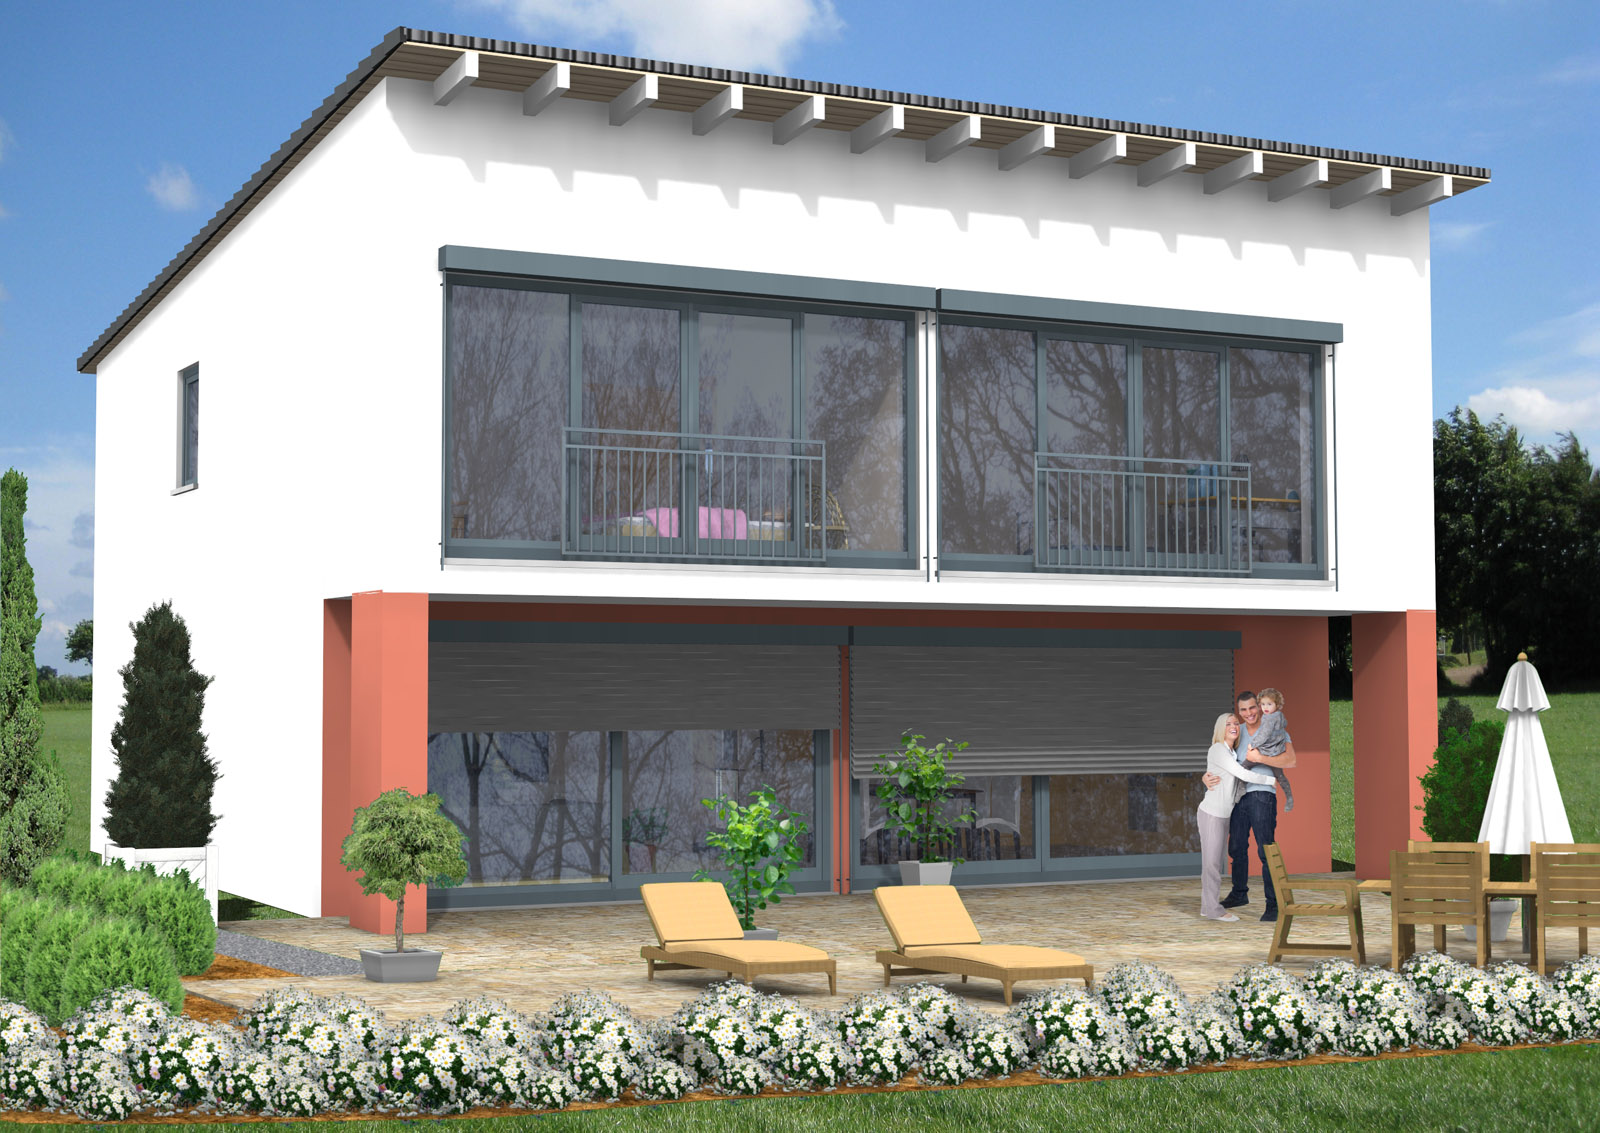 bauberatung baubetreuung baufinanzierung bauplanung pultdachhaus 162 m. Black Bedroom Furniture Sets. Home Design Ideas